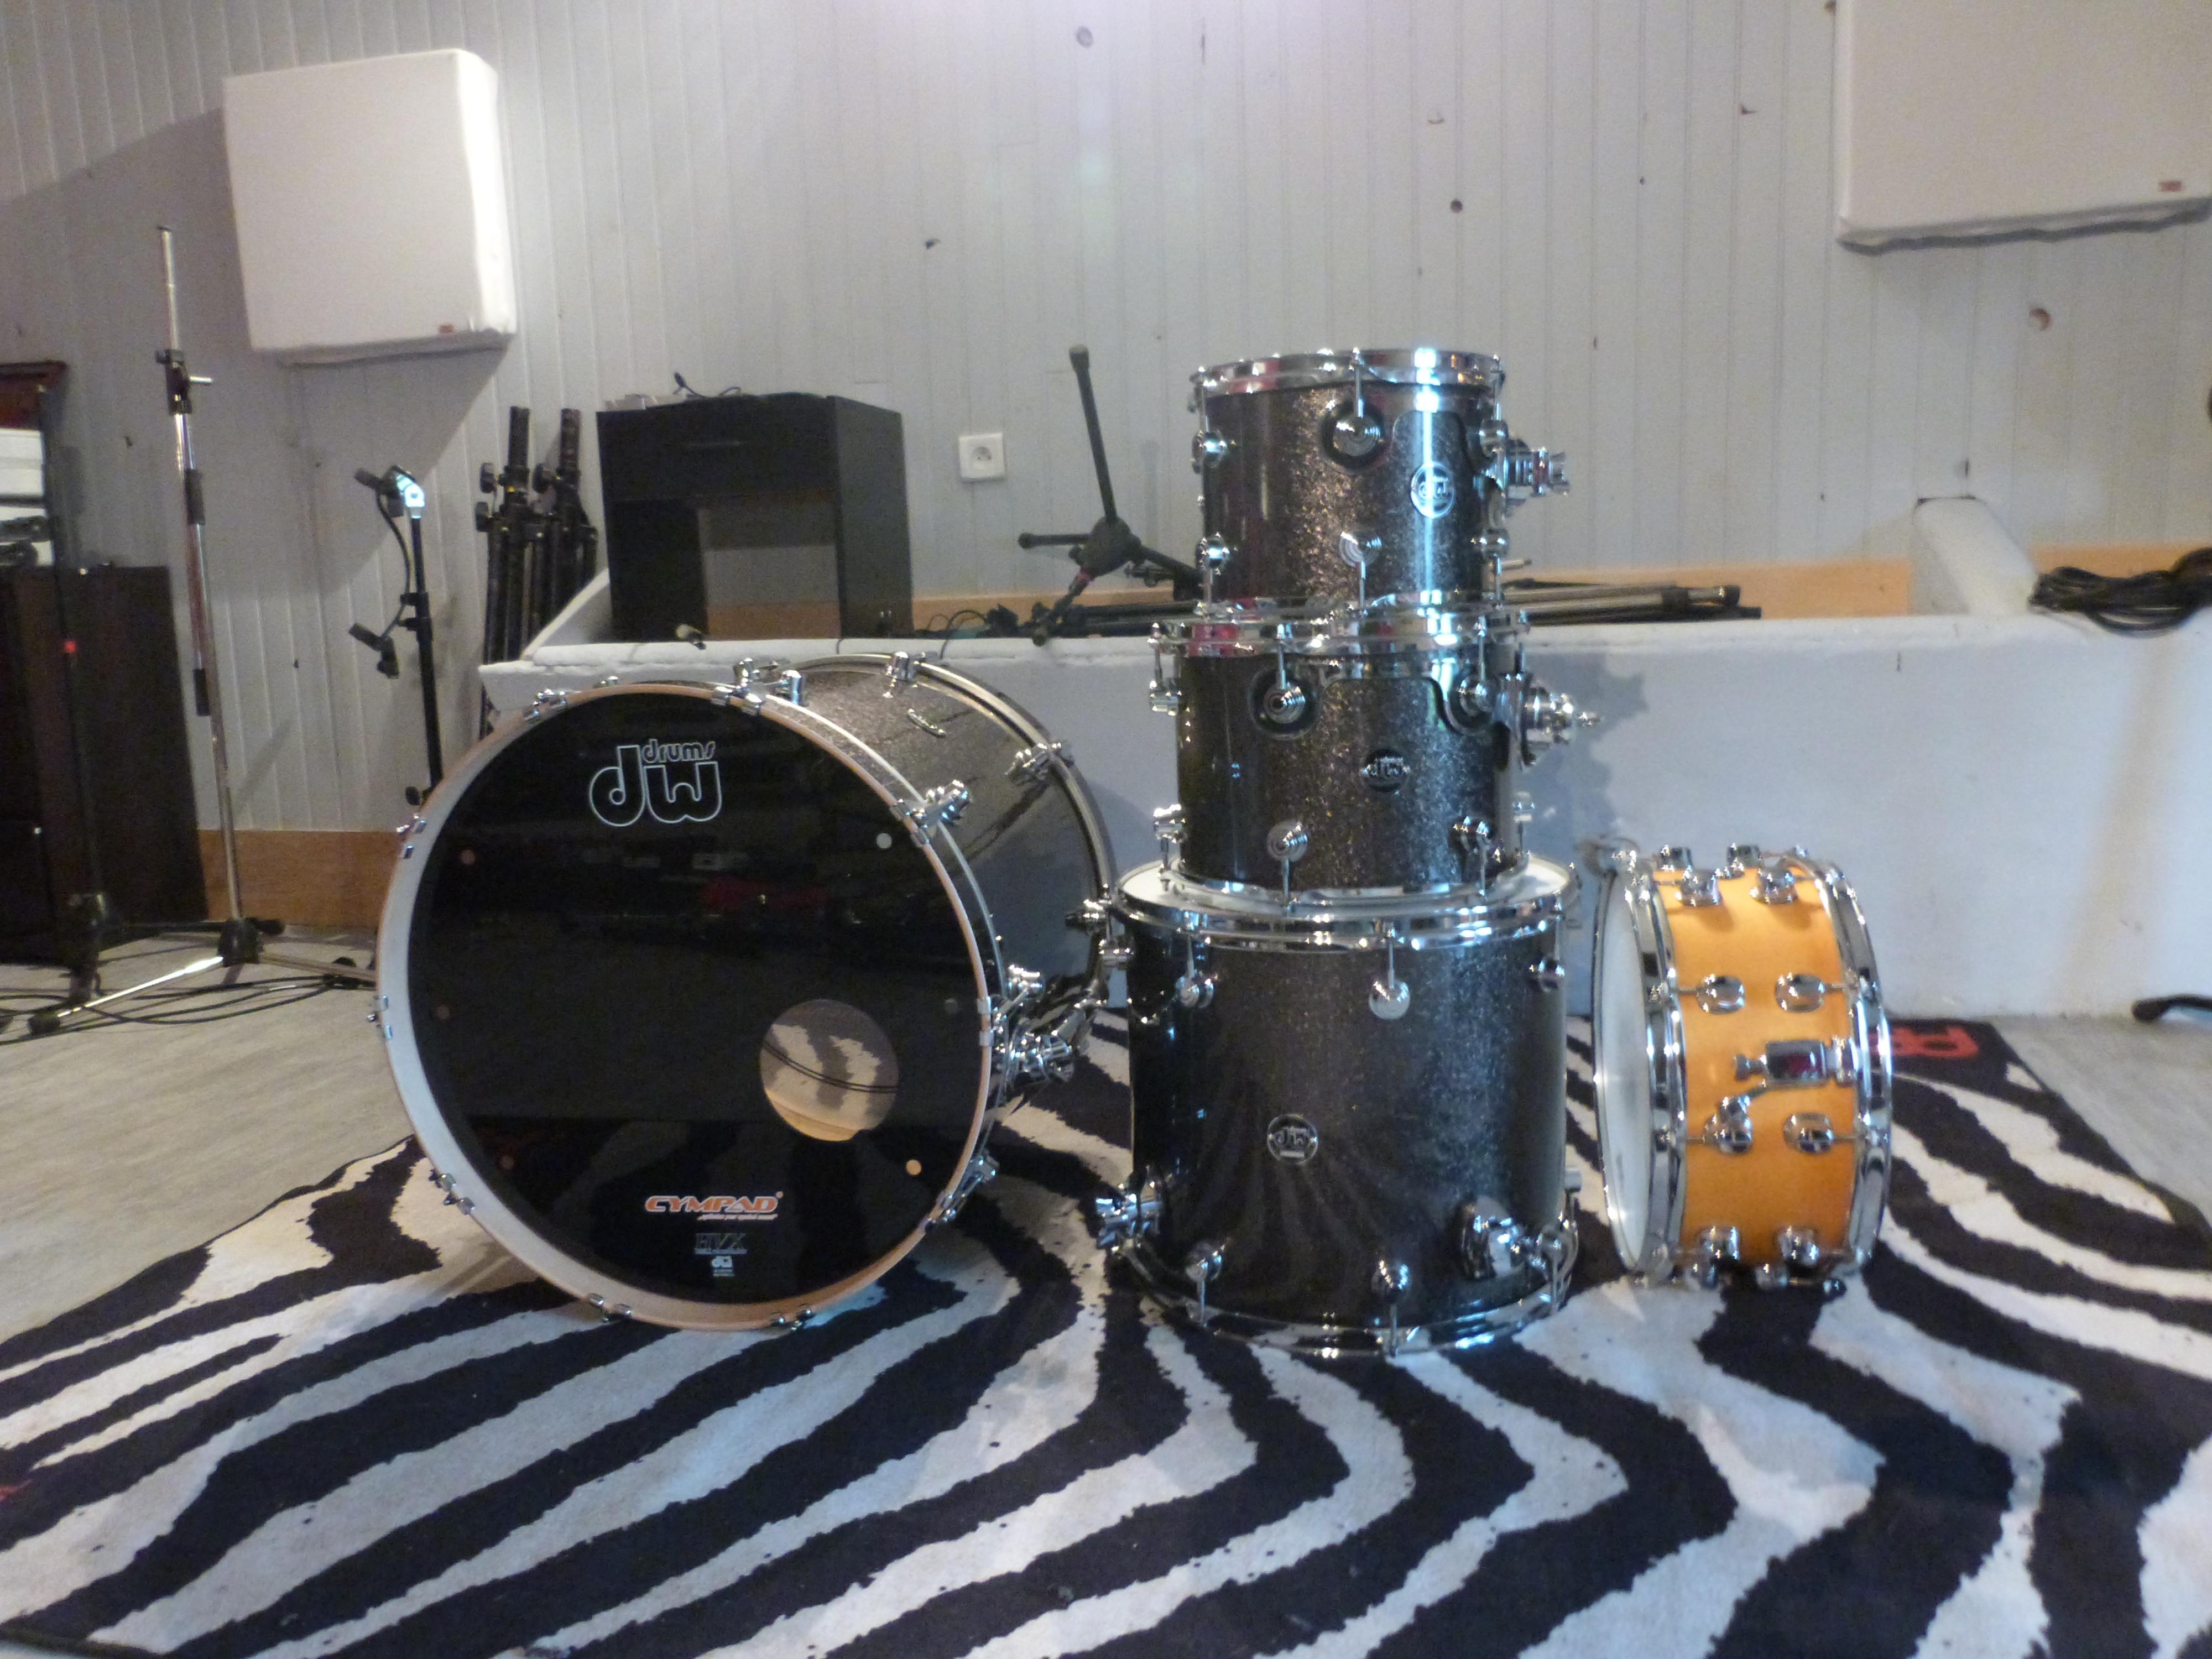 dw drums performance series image 727292 audiofanzine. Black Bedroom Furniture Sets. Home Design Ideas